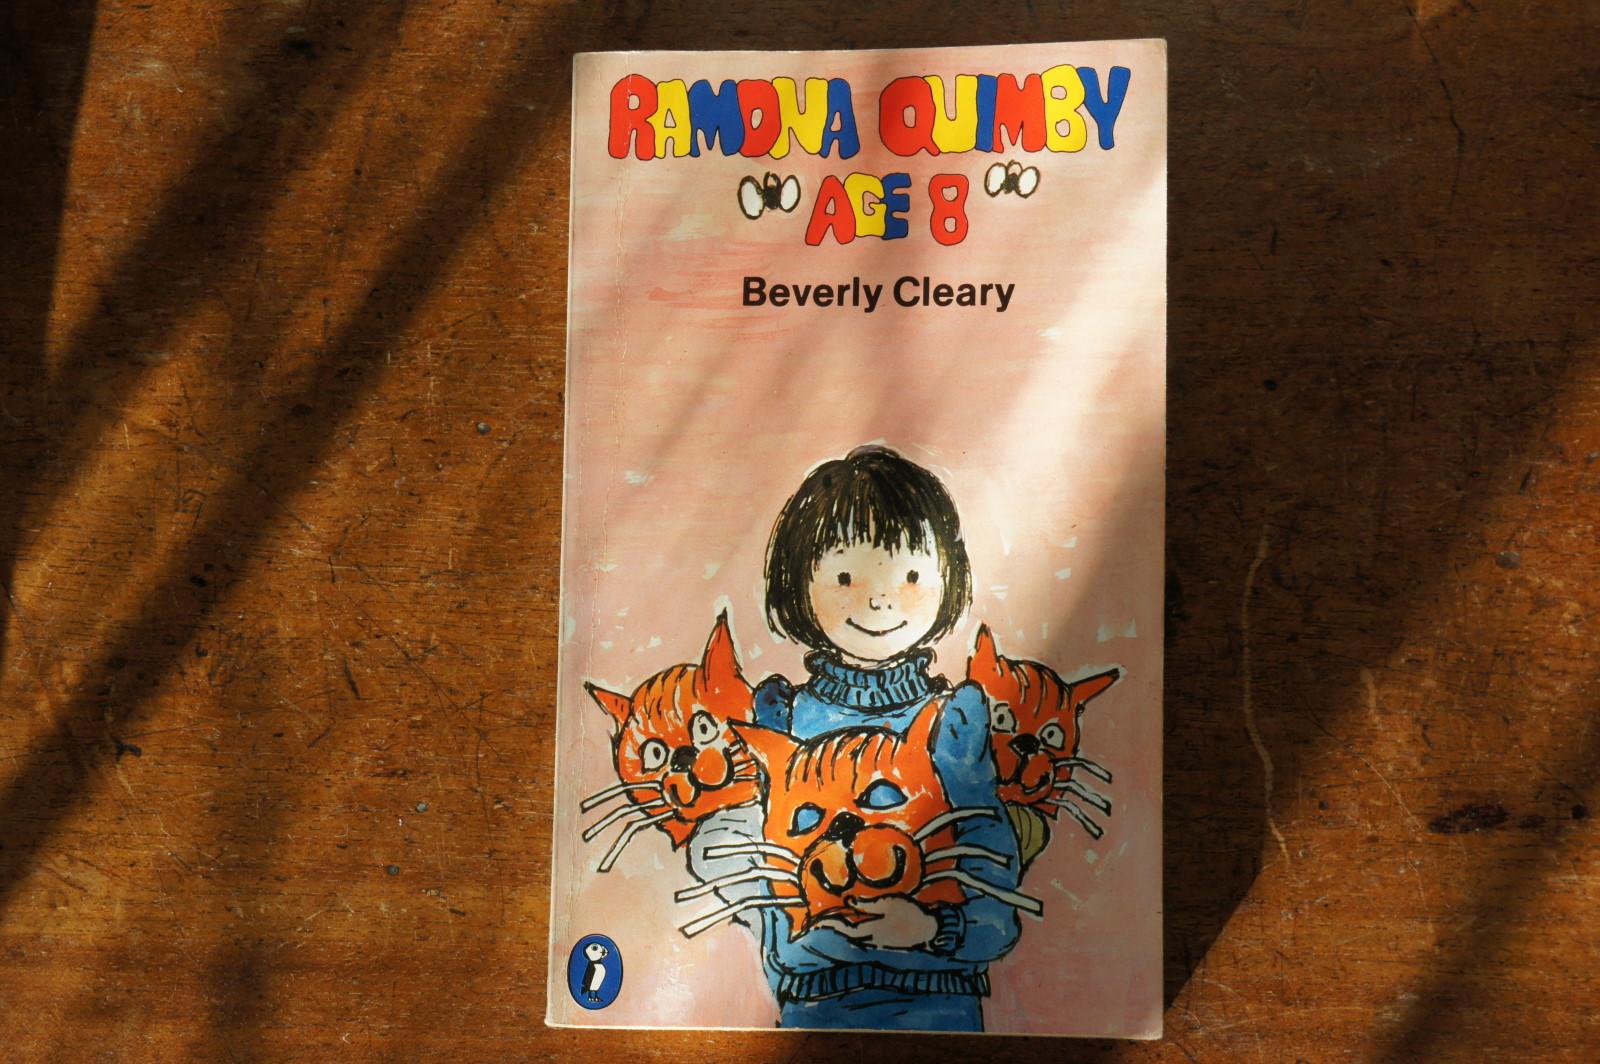 We Love Ramona Quimby